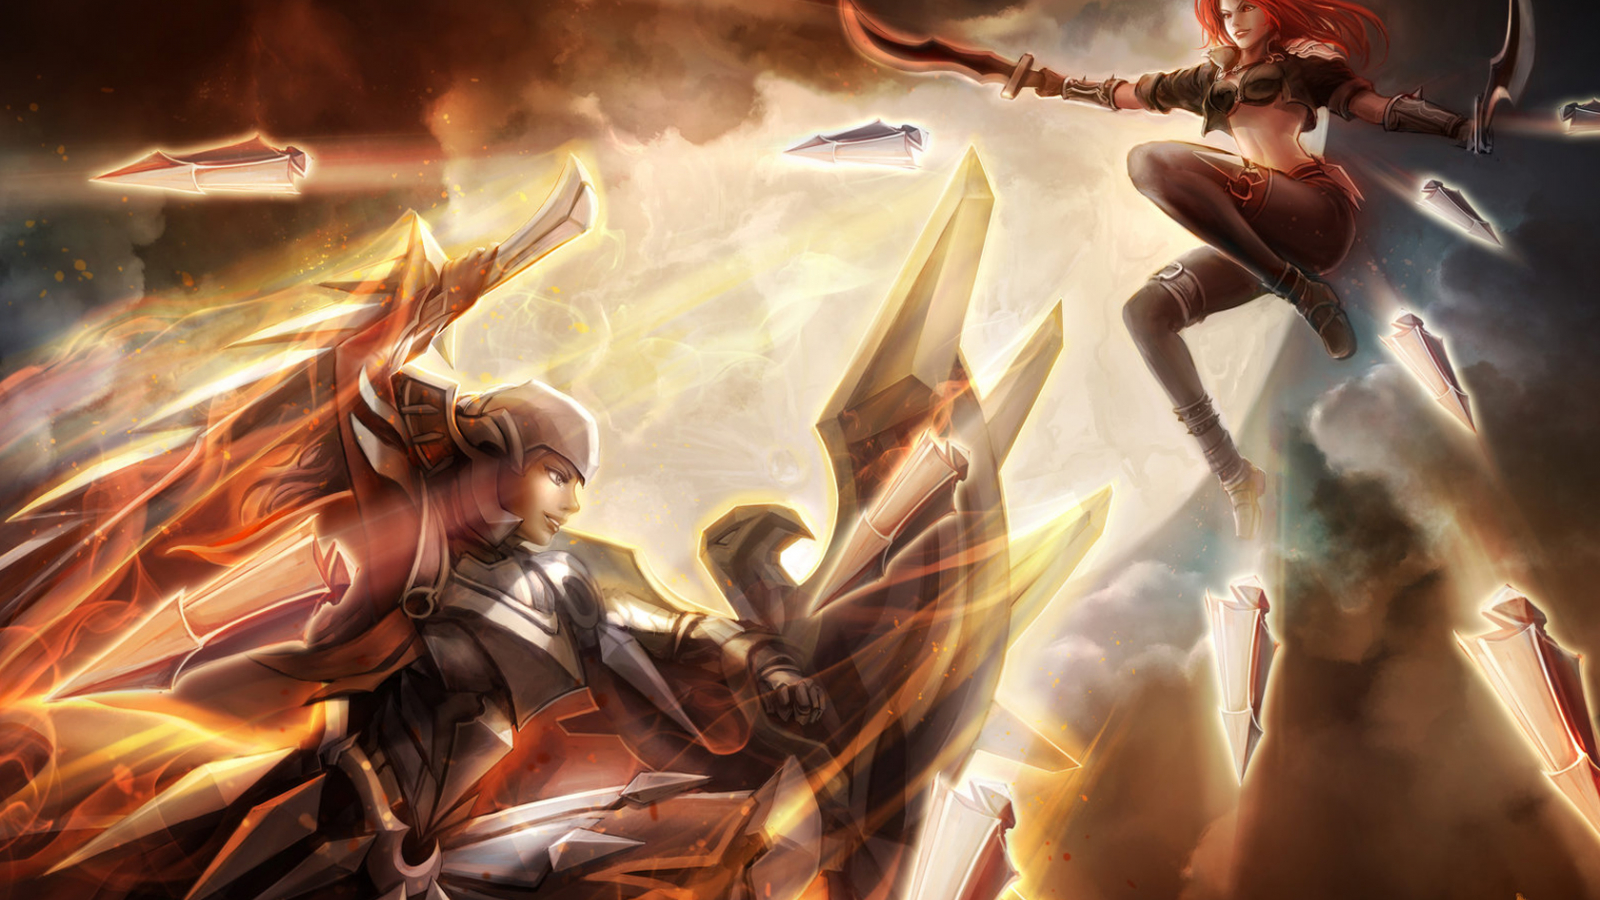 Free Download Katarina Vs Leona Fighting Girl League Of Legends Hd